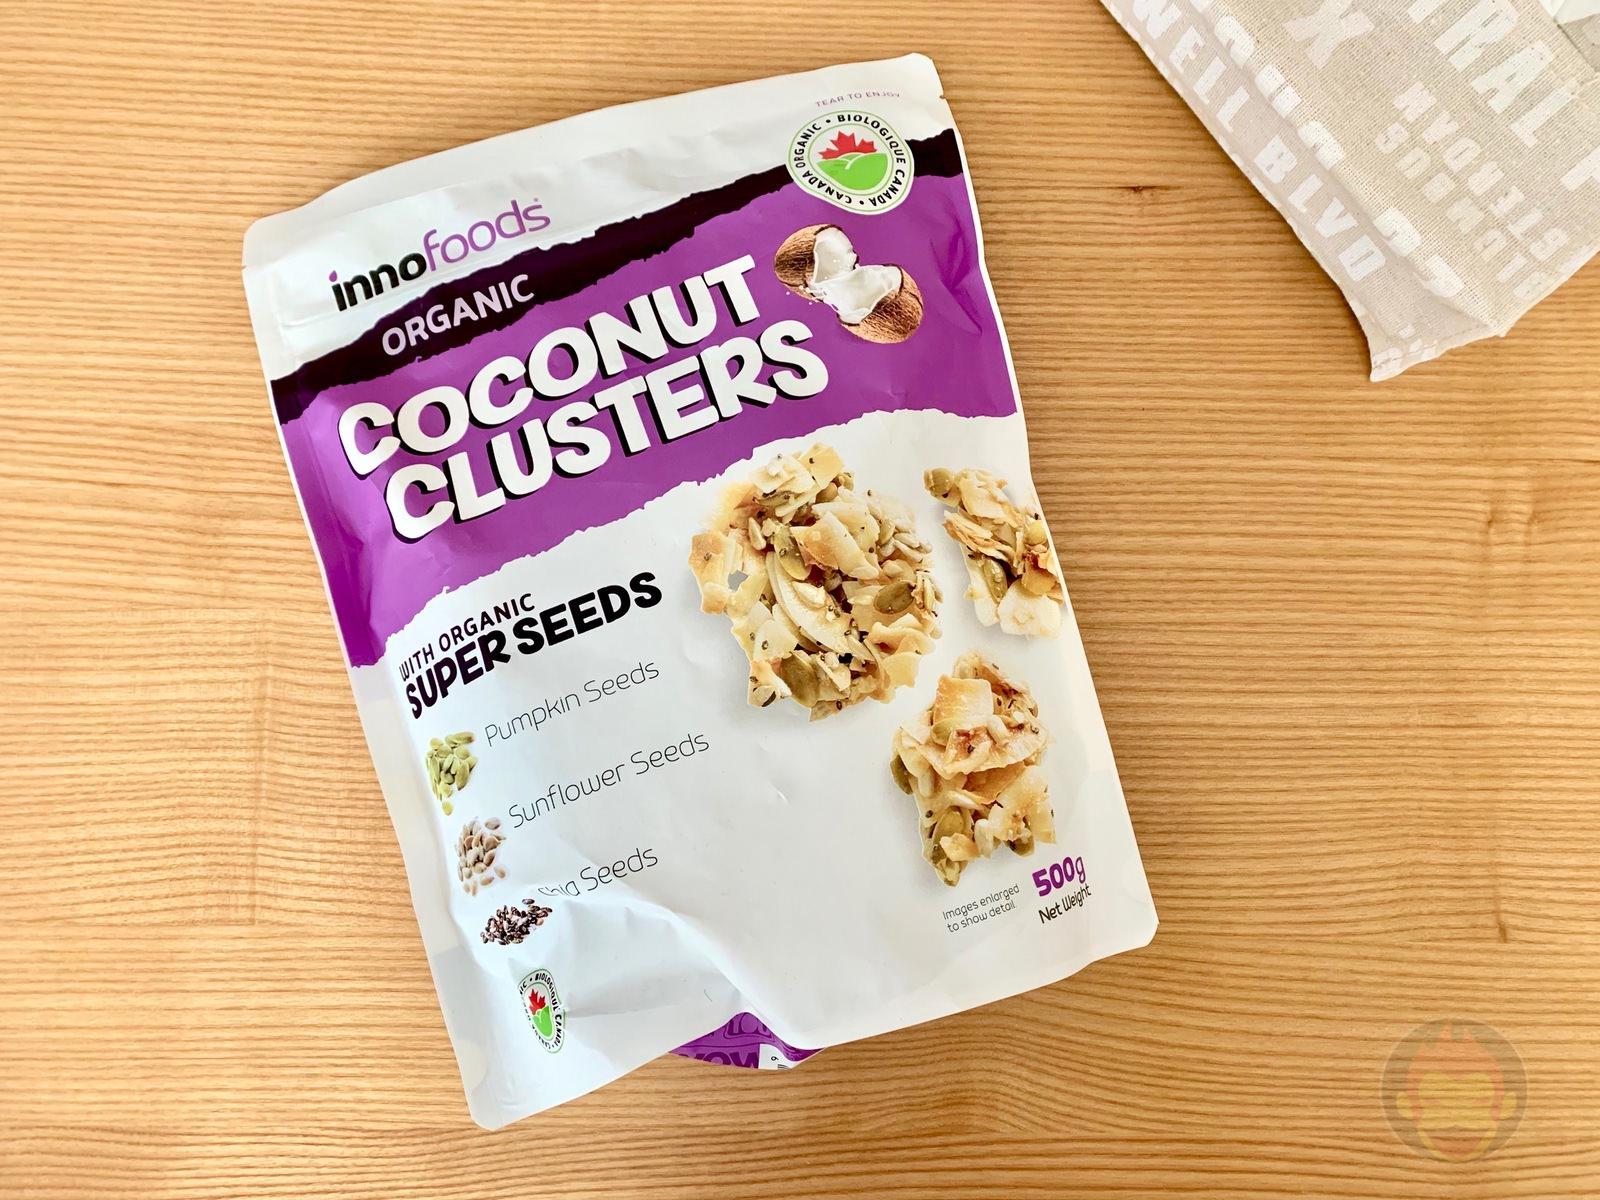 Costoco Coconut Clusters 04